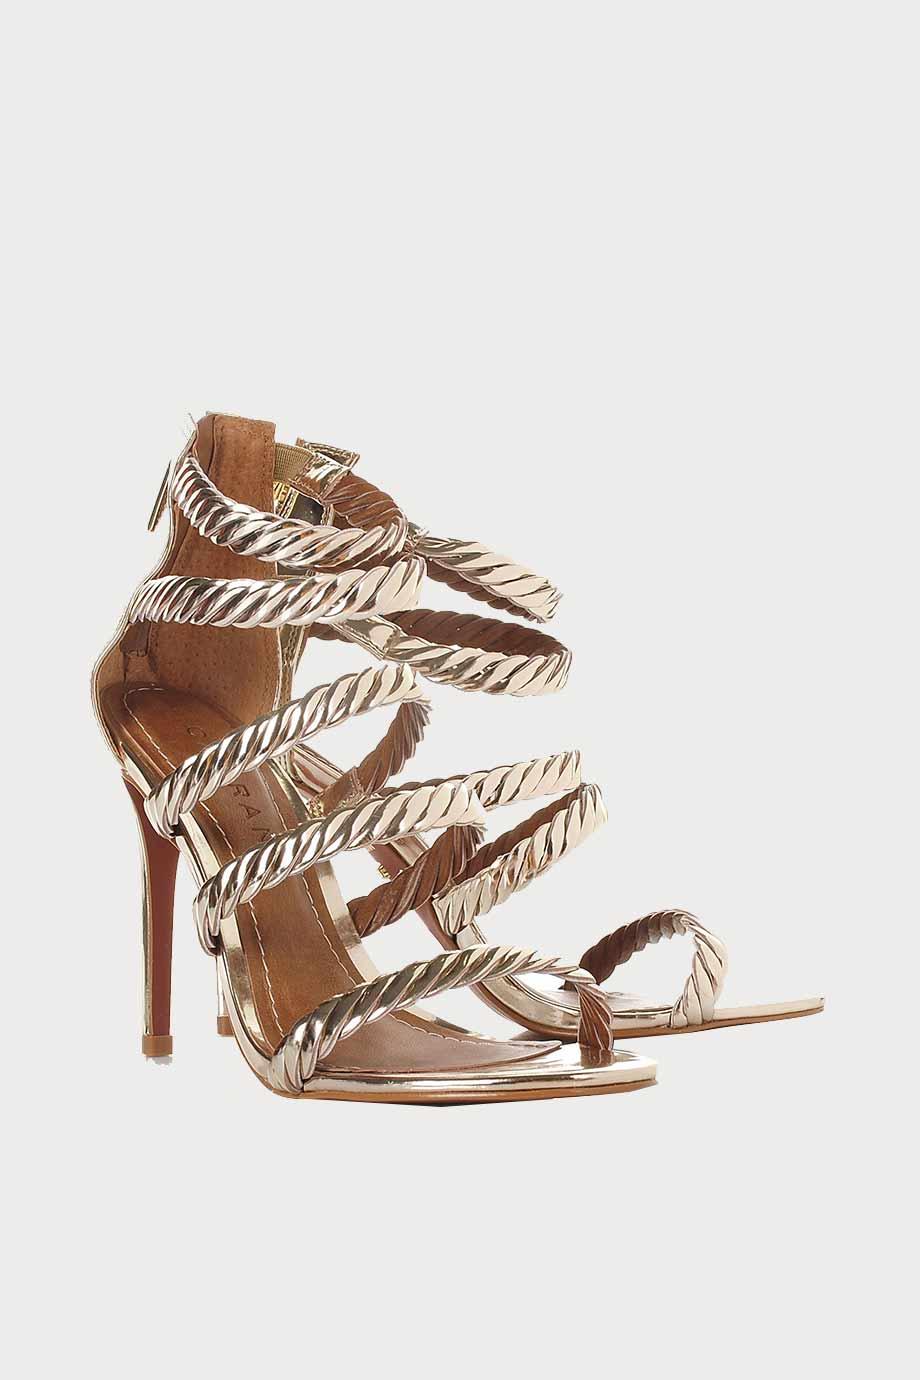 spiridoula metheniti shoes xalkida p Carrano 143005 CAB1 Specchi 2